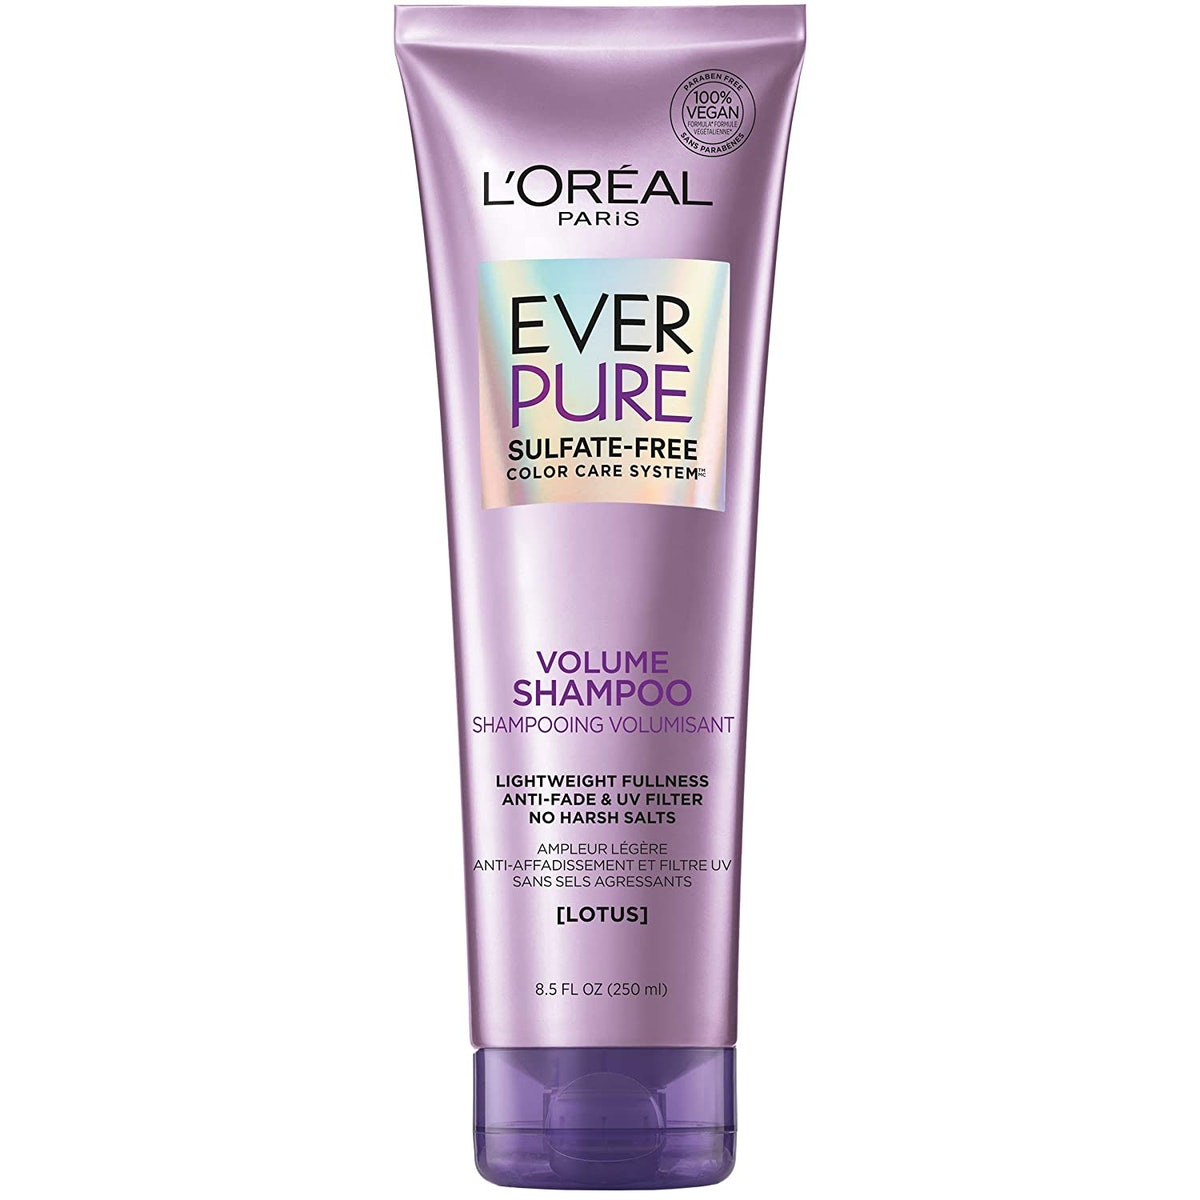 L'Oreal Paris EverPure Sulfate Free Volume Shampoo